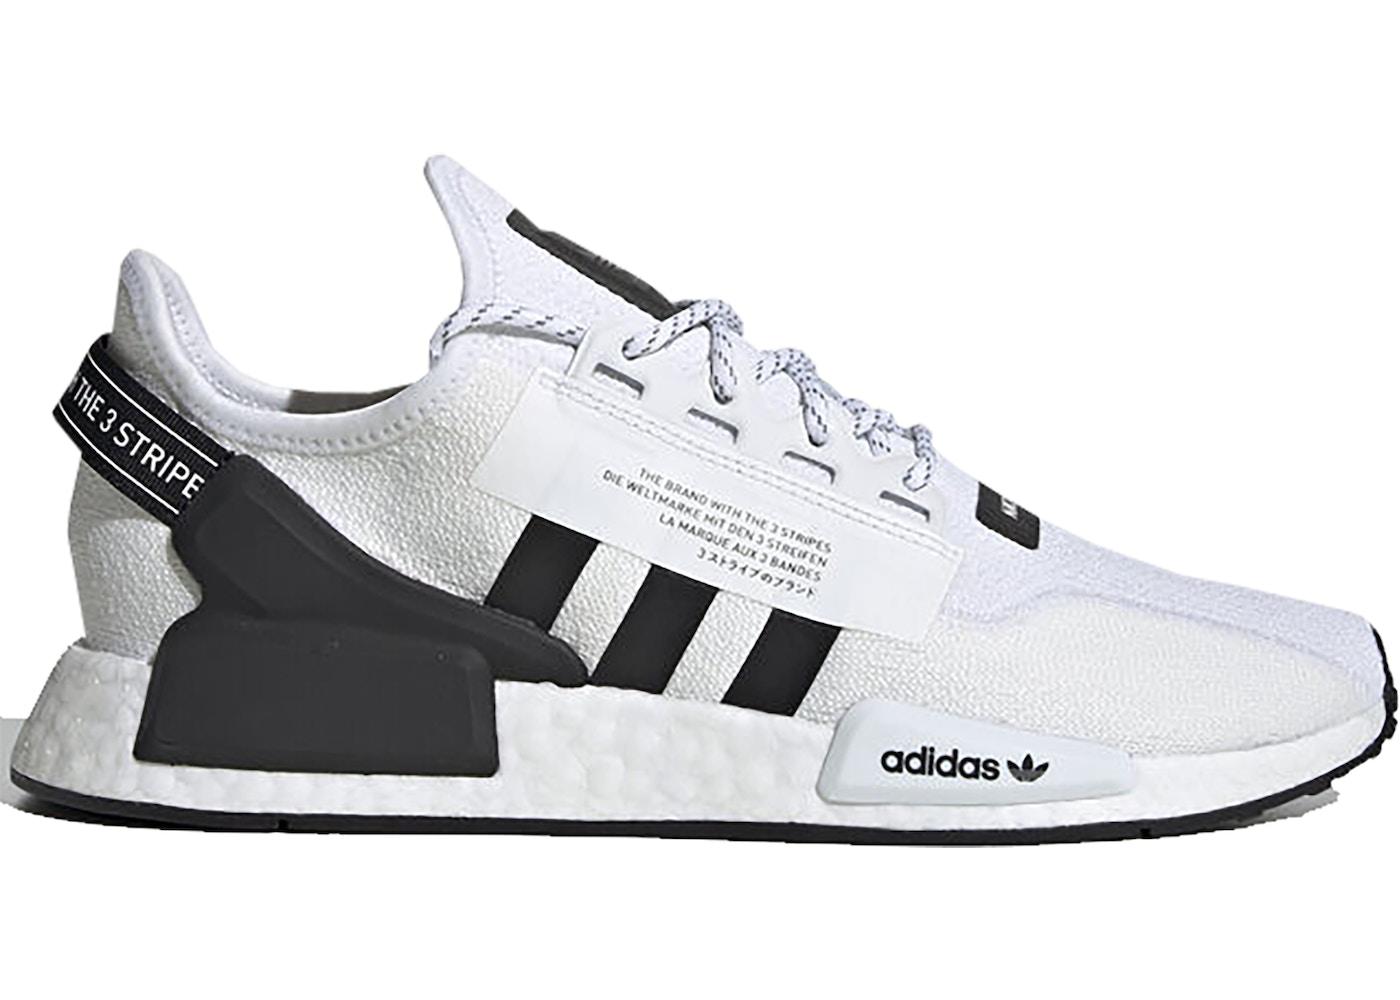 adidas NMD R1 Core BlackGrey Two Footwear White CQ0759